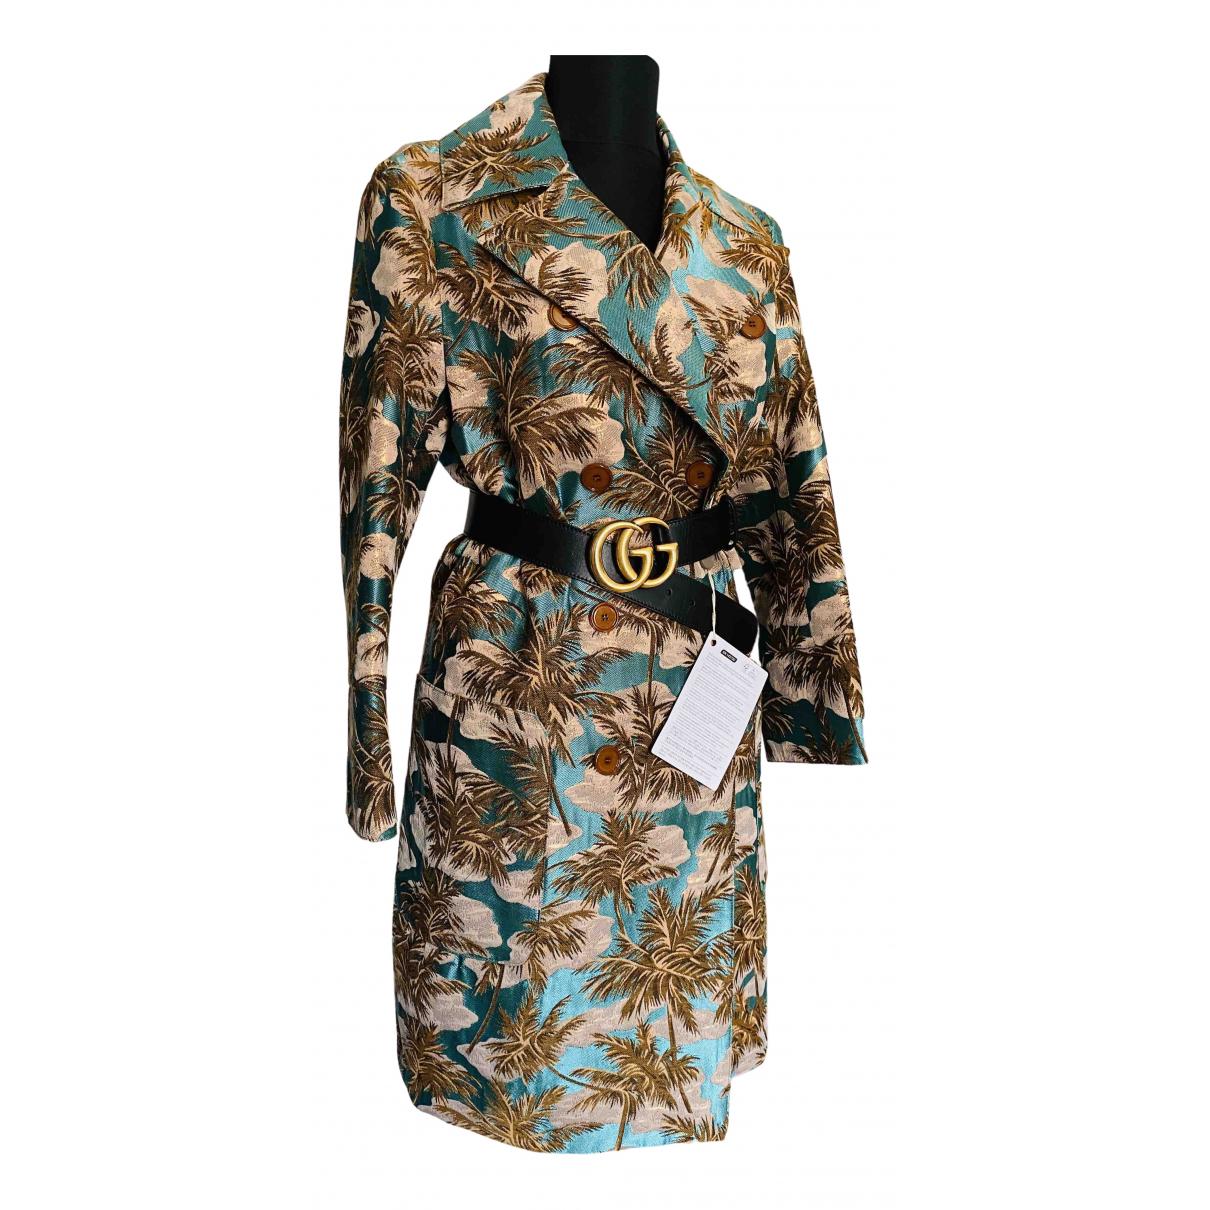 Tagliatore \N Multicolour jacket for Women 40 IT